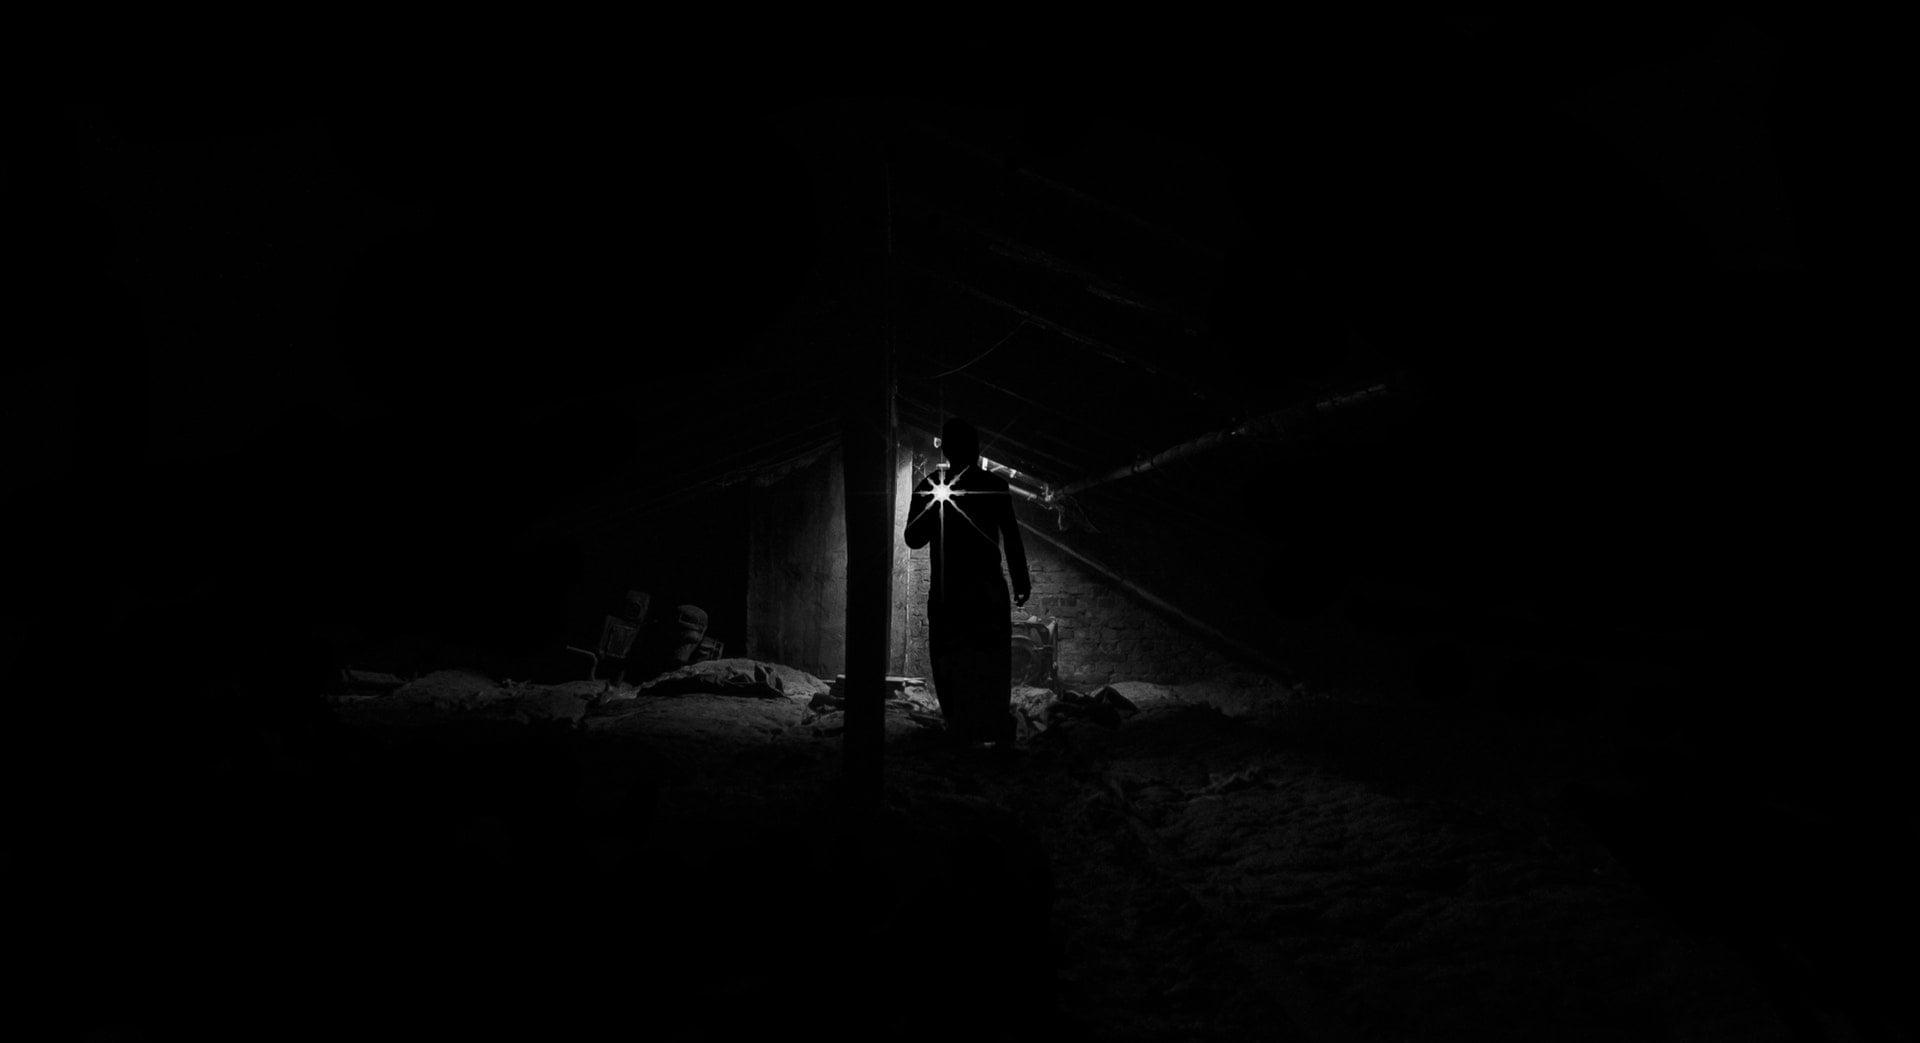 light lamp low angle view of man standing at night 旅行攝影 5+1 拍照技術教學 📷 記錄下精彩的旅途風景